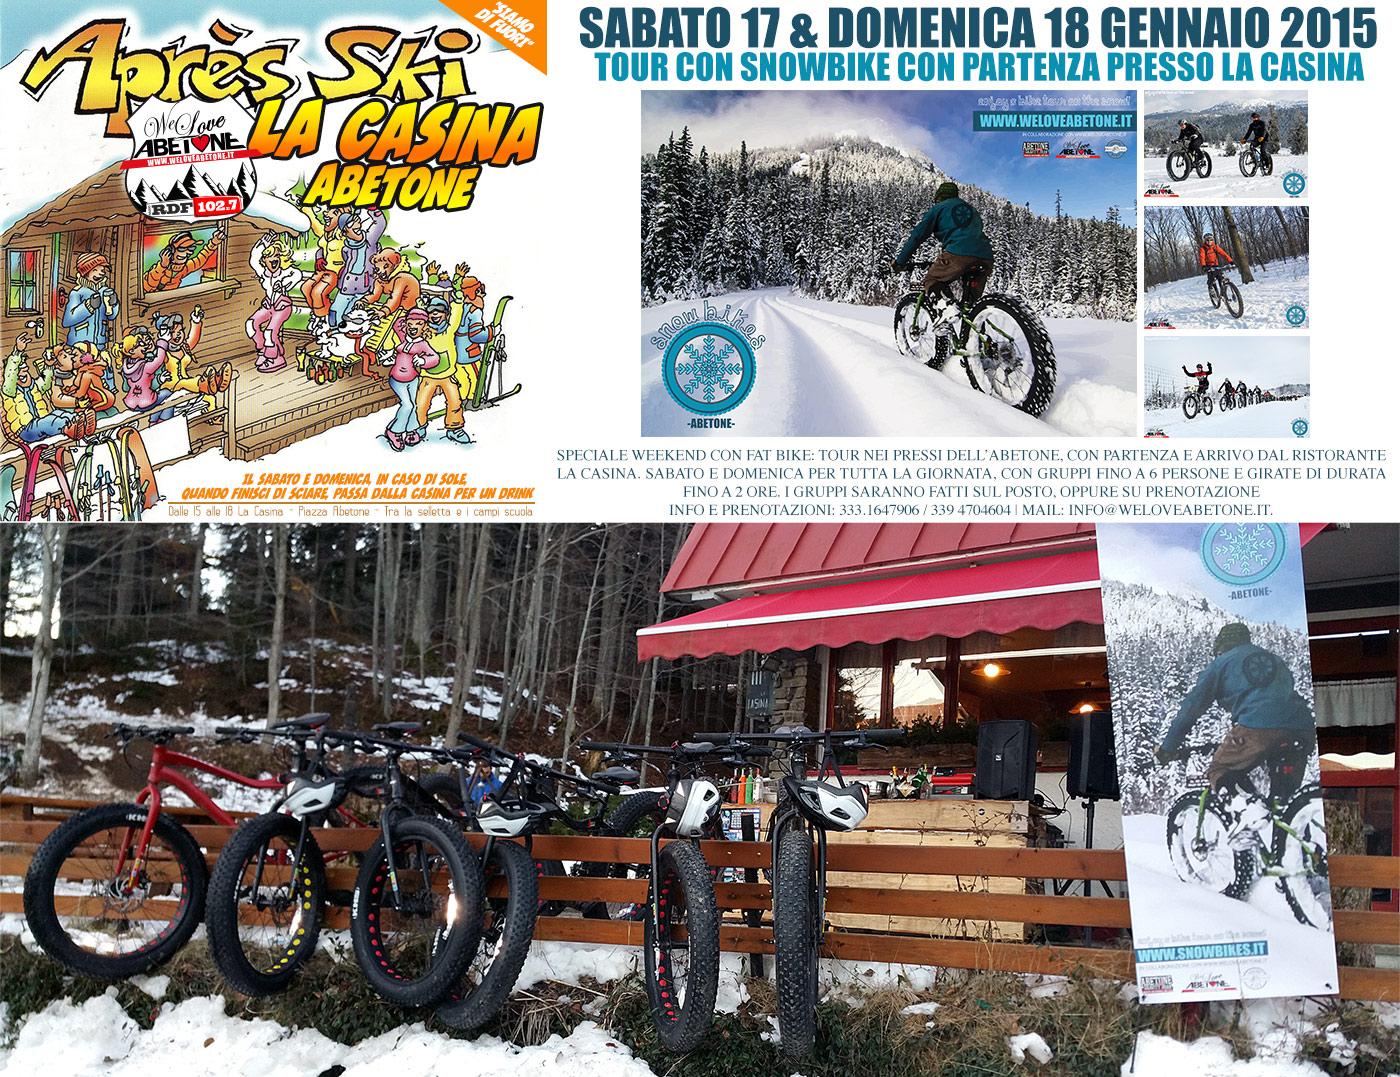 Weekend 17 U002618 Gennaio 2015  Snowbike  Apres Ski